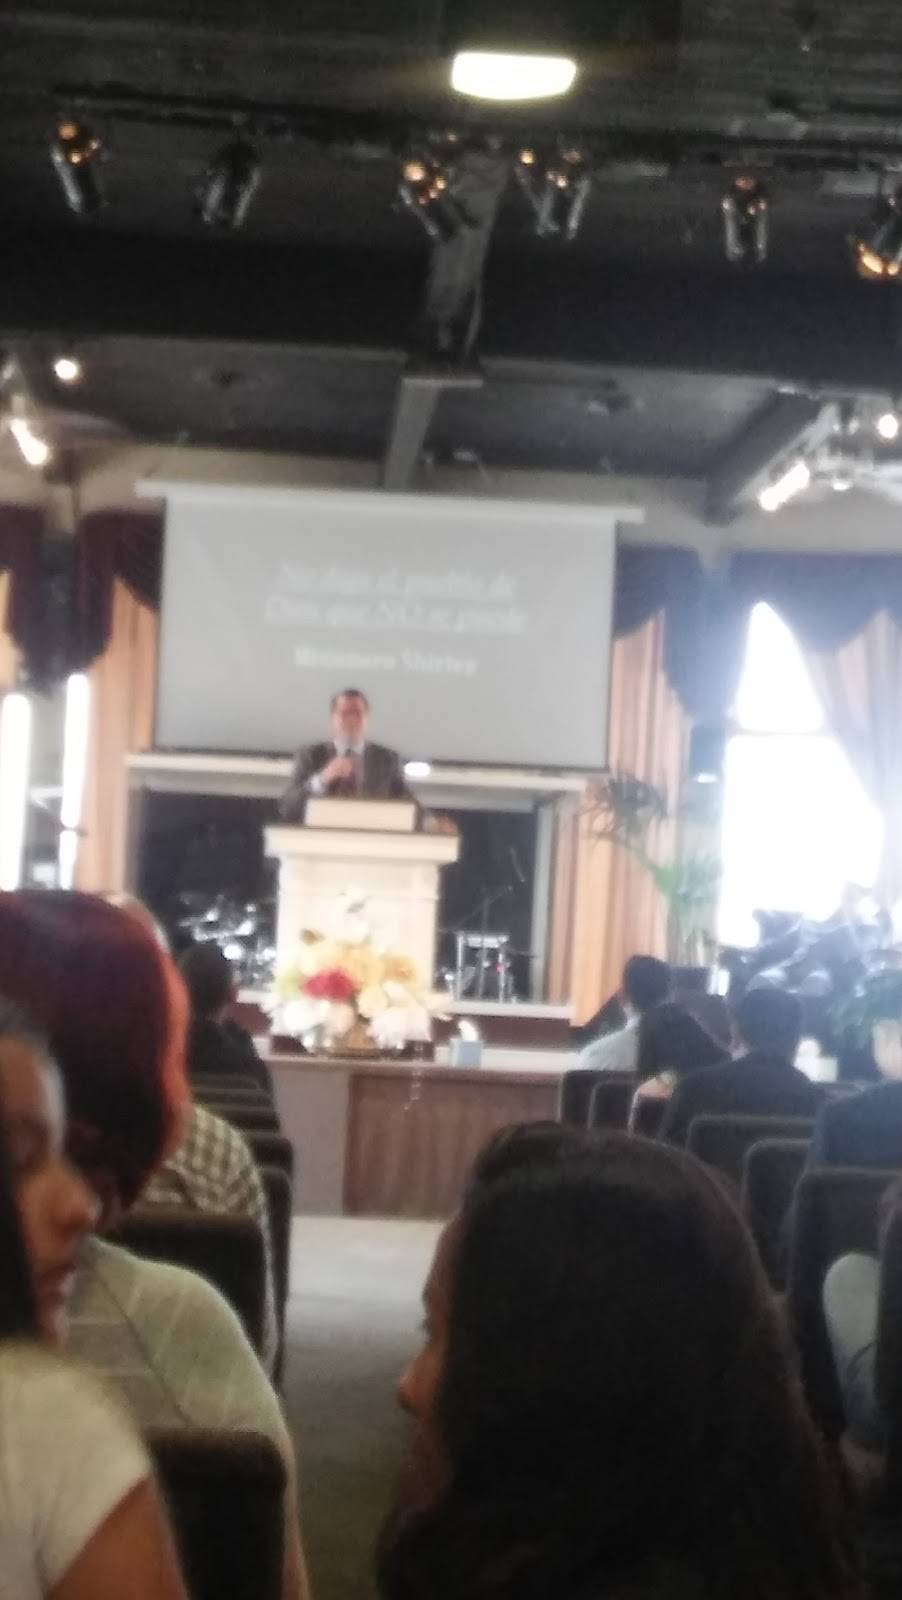 Pentecostals of San Francisco - church  | Photo 4 of 4 | Address: 2011 Bayshore Blvd, San Francisco, CA 94124, USA | Phone: (415) 330-9600